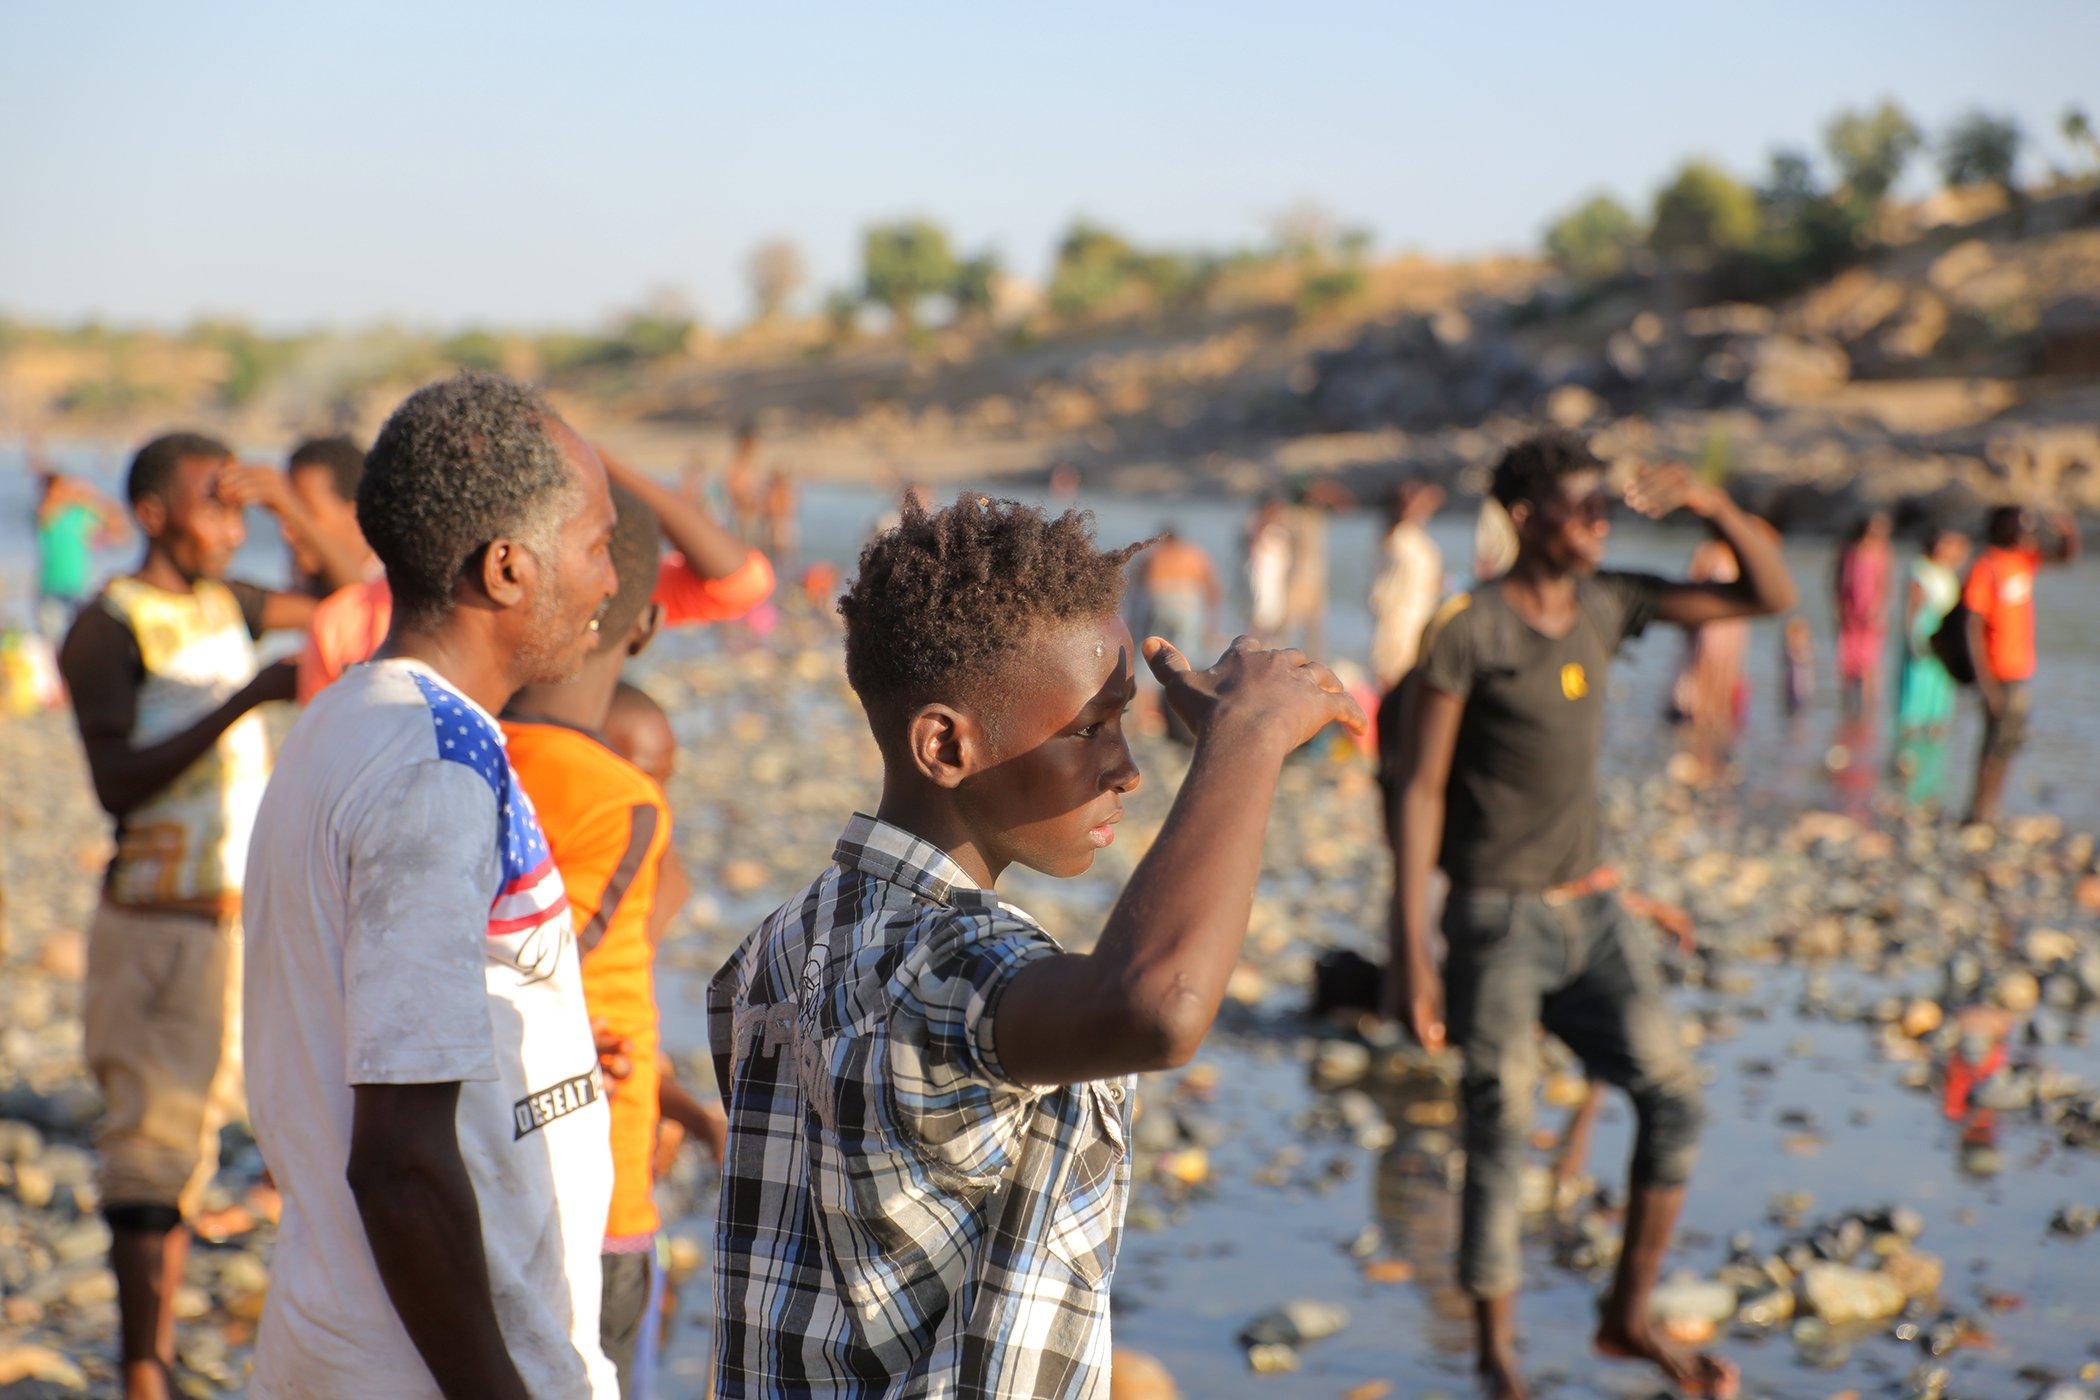 Ethiopia-Tigray-Refugees-Humanitarian-Crisis-UNHCR-001.jpg